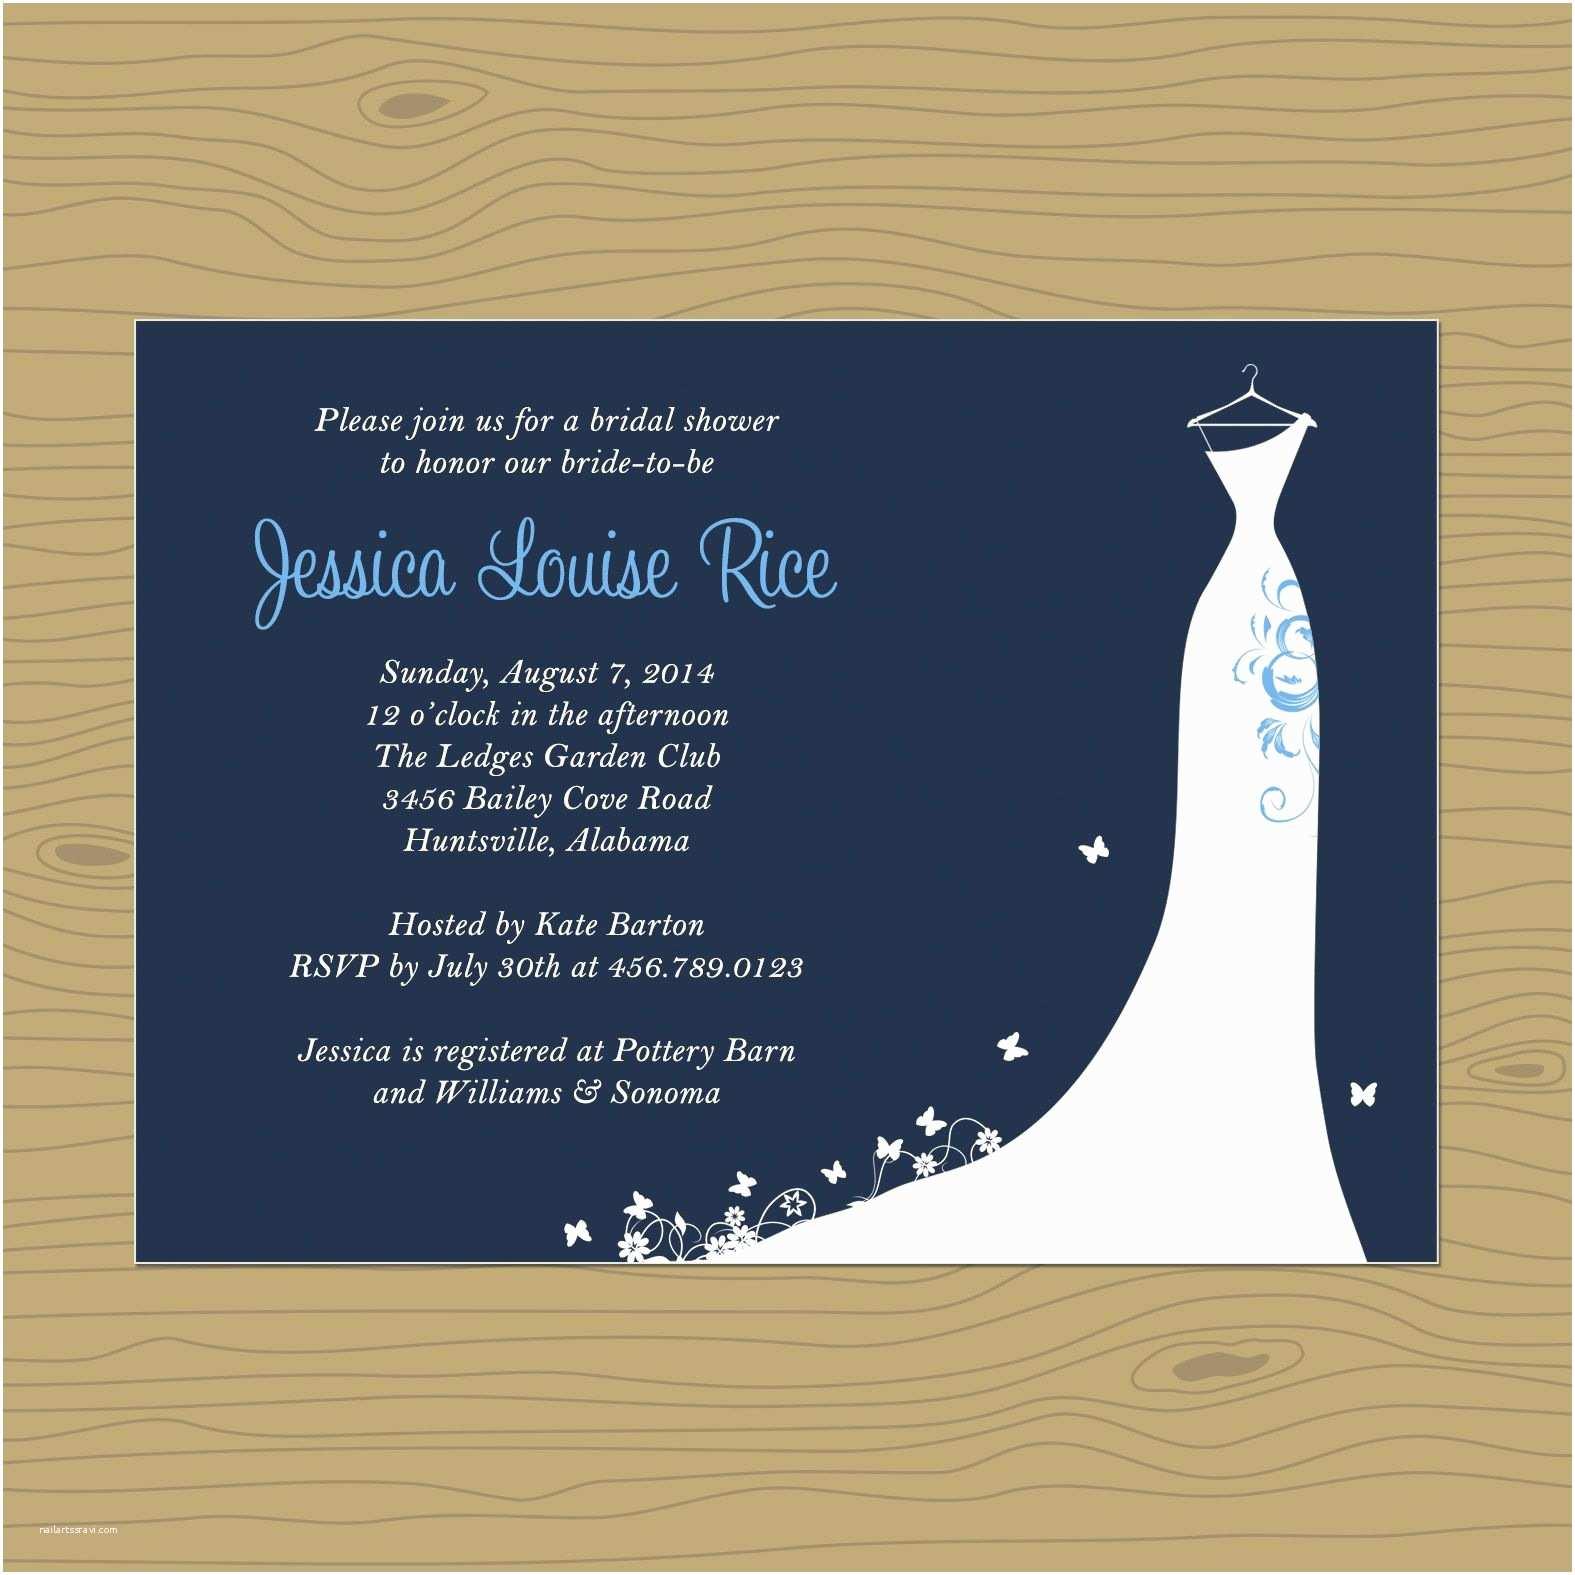 Vistaprint Wedding Invitations Reviews Vista Print Bridal Shower Invites Engagement Party